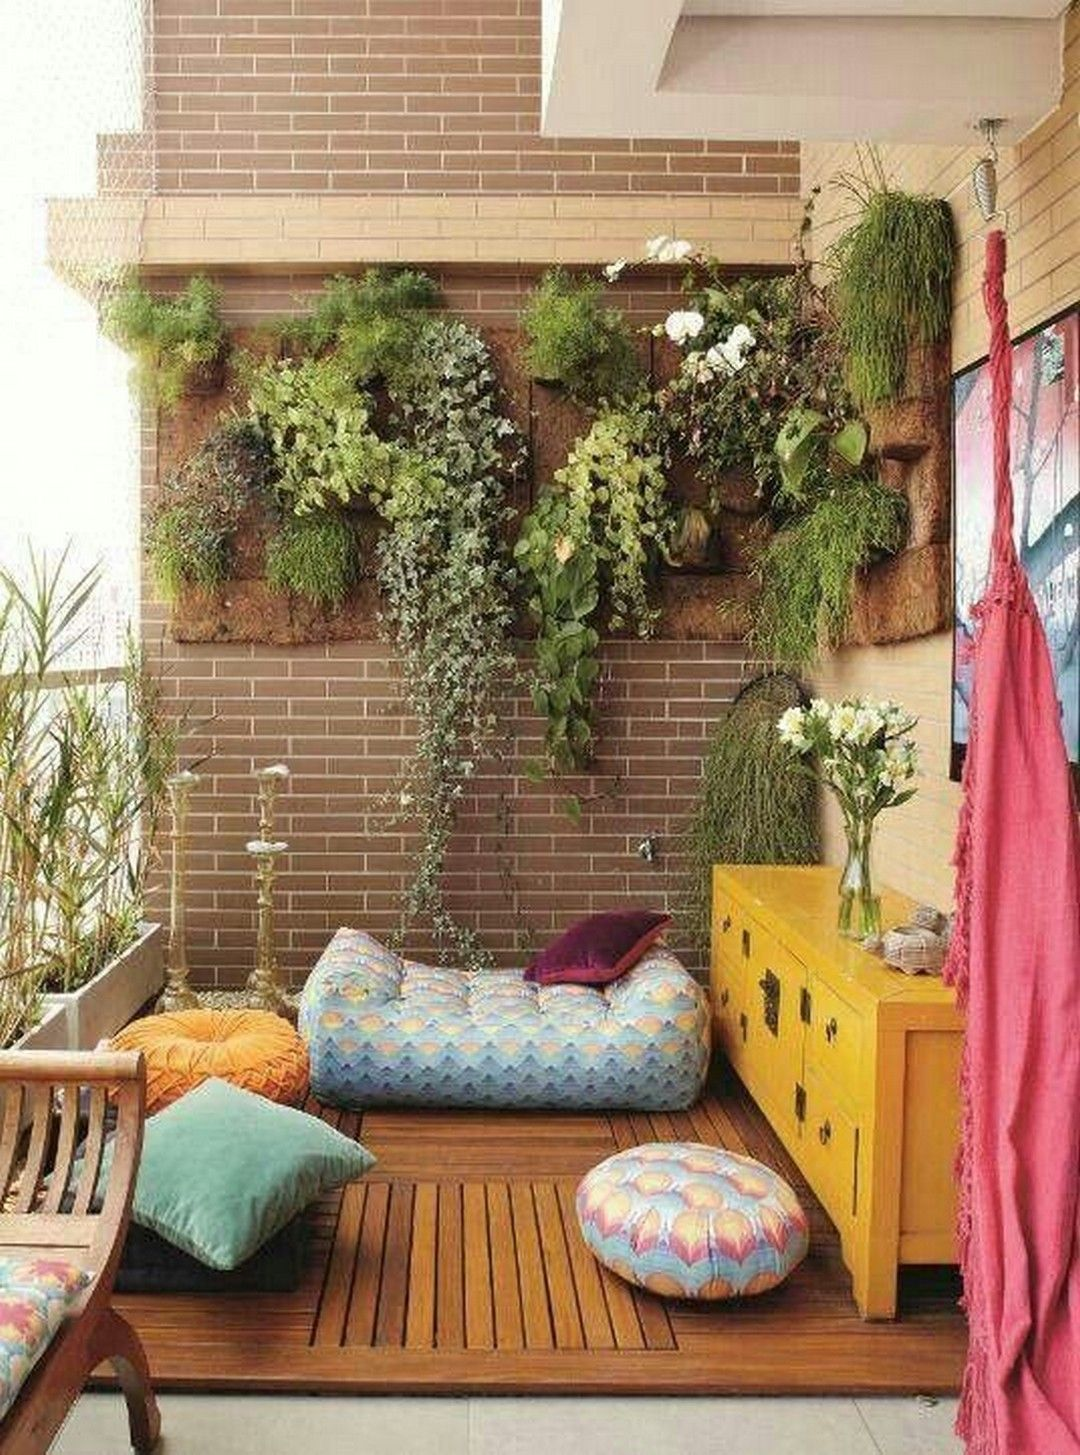 88 DIY Simple Outdoor Wall Decorations Ideas